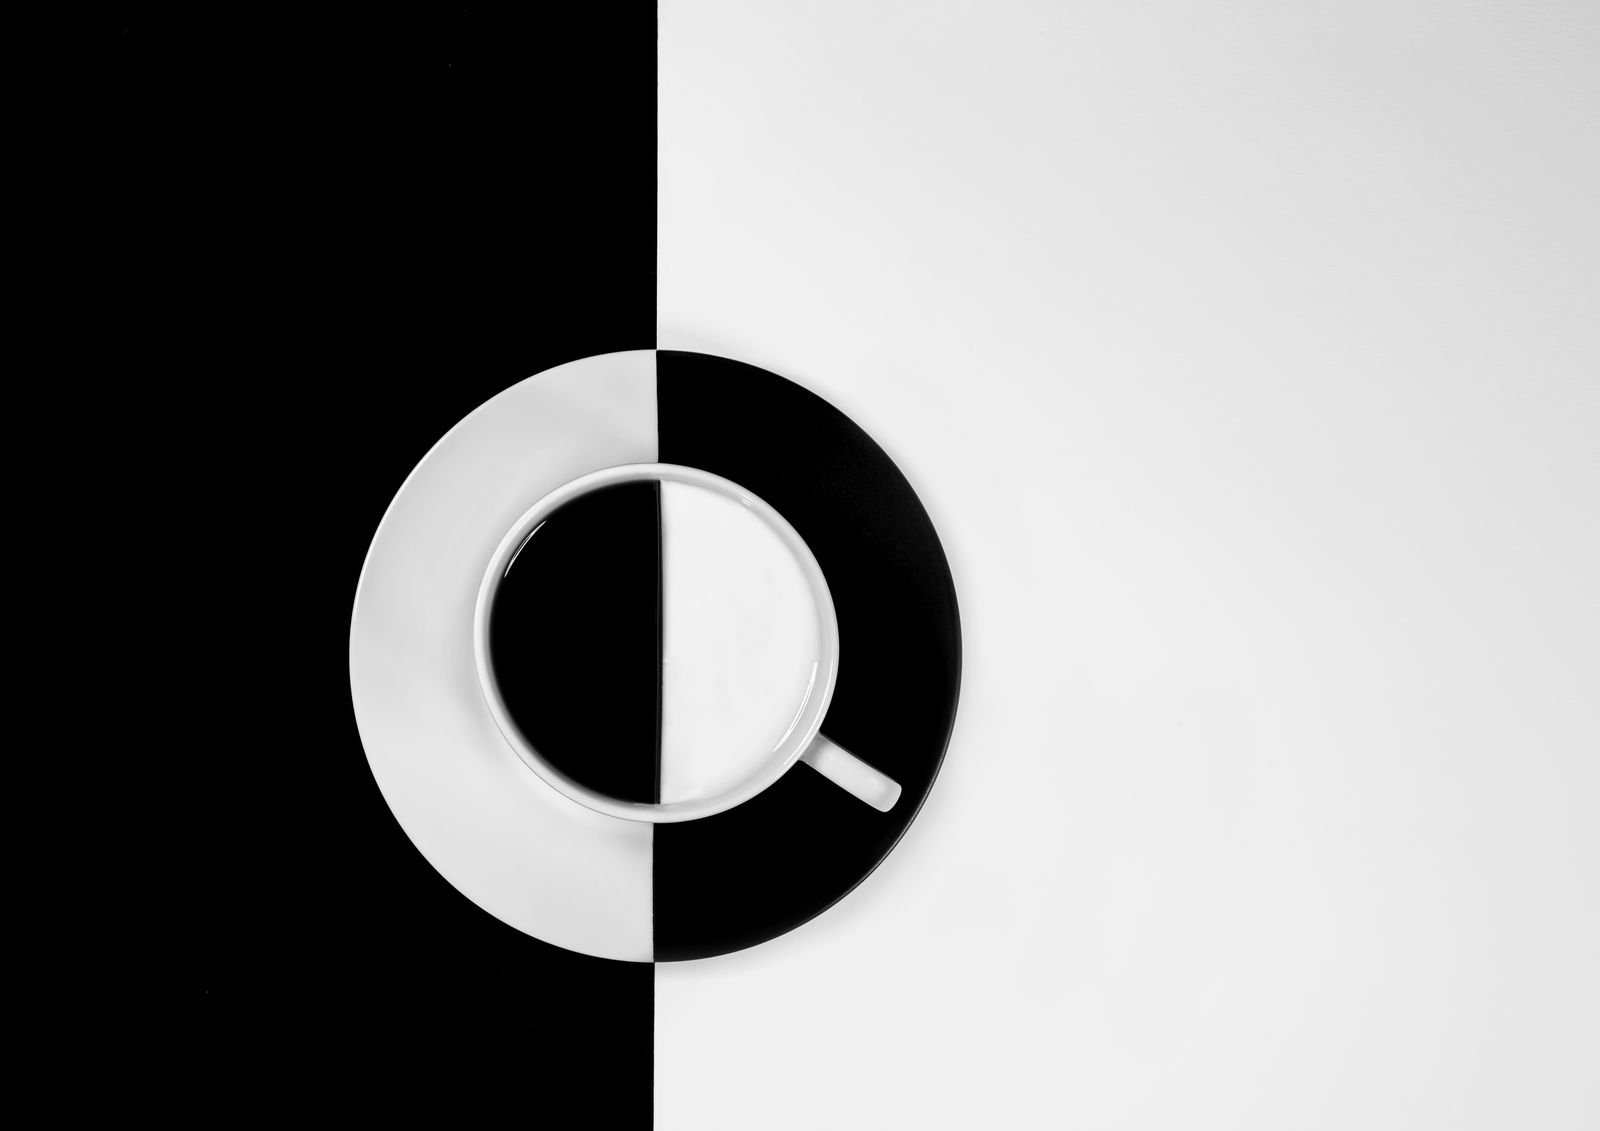 Black & white, Black and white, Jozef kiss, Jozefkiss.eu, Still life, Jozef Kiss